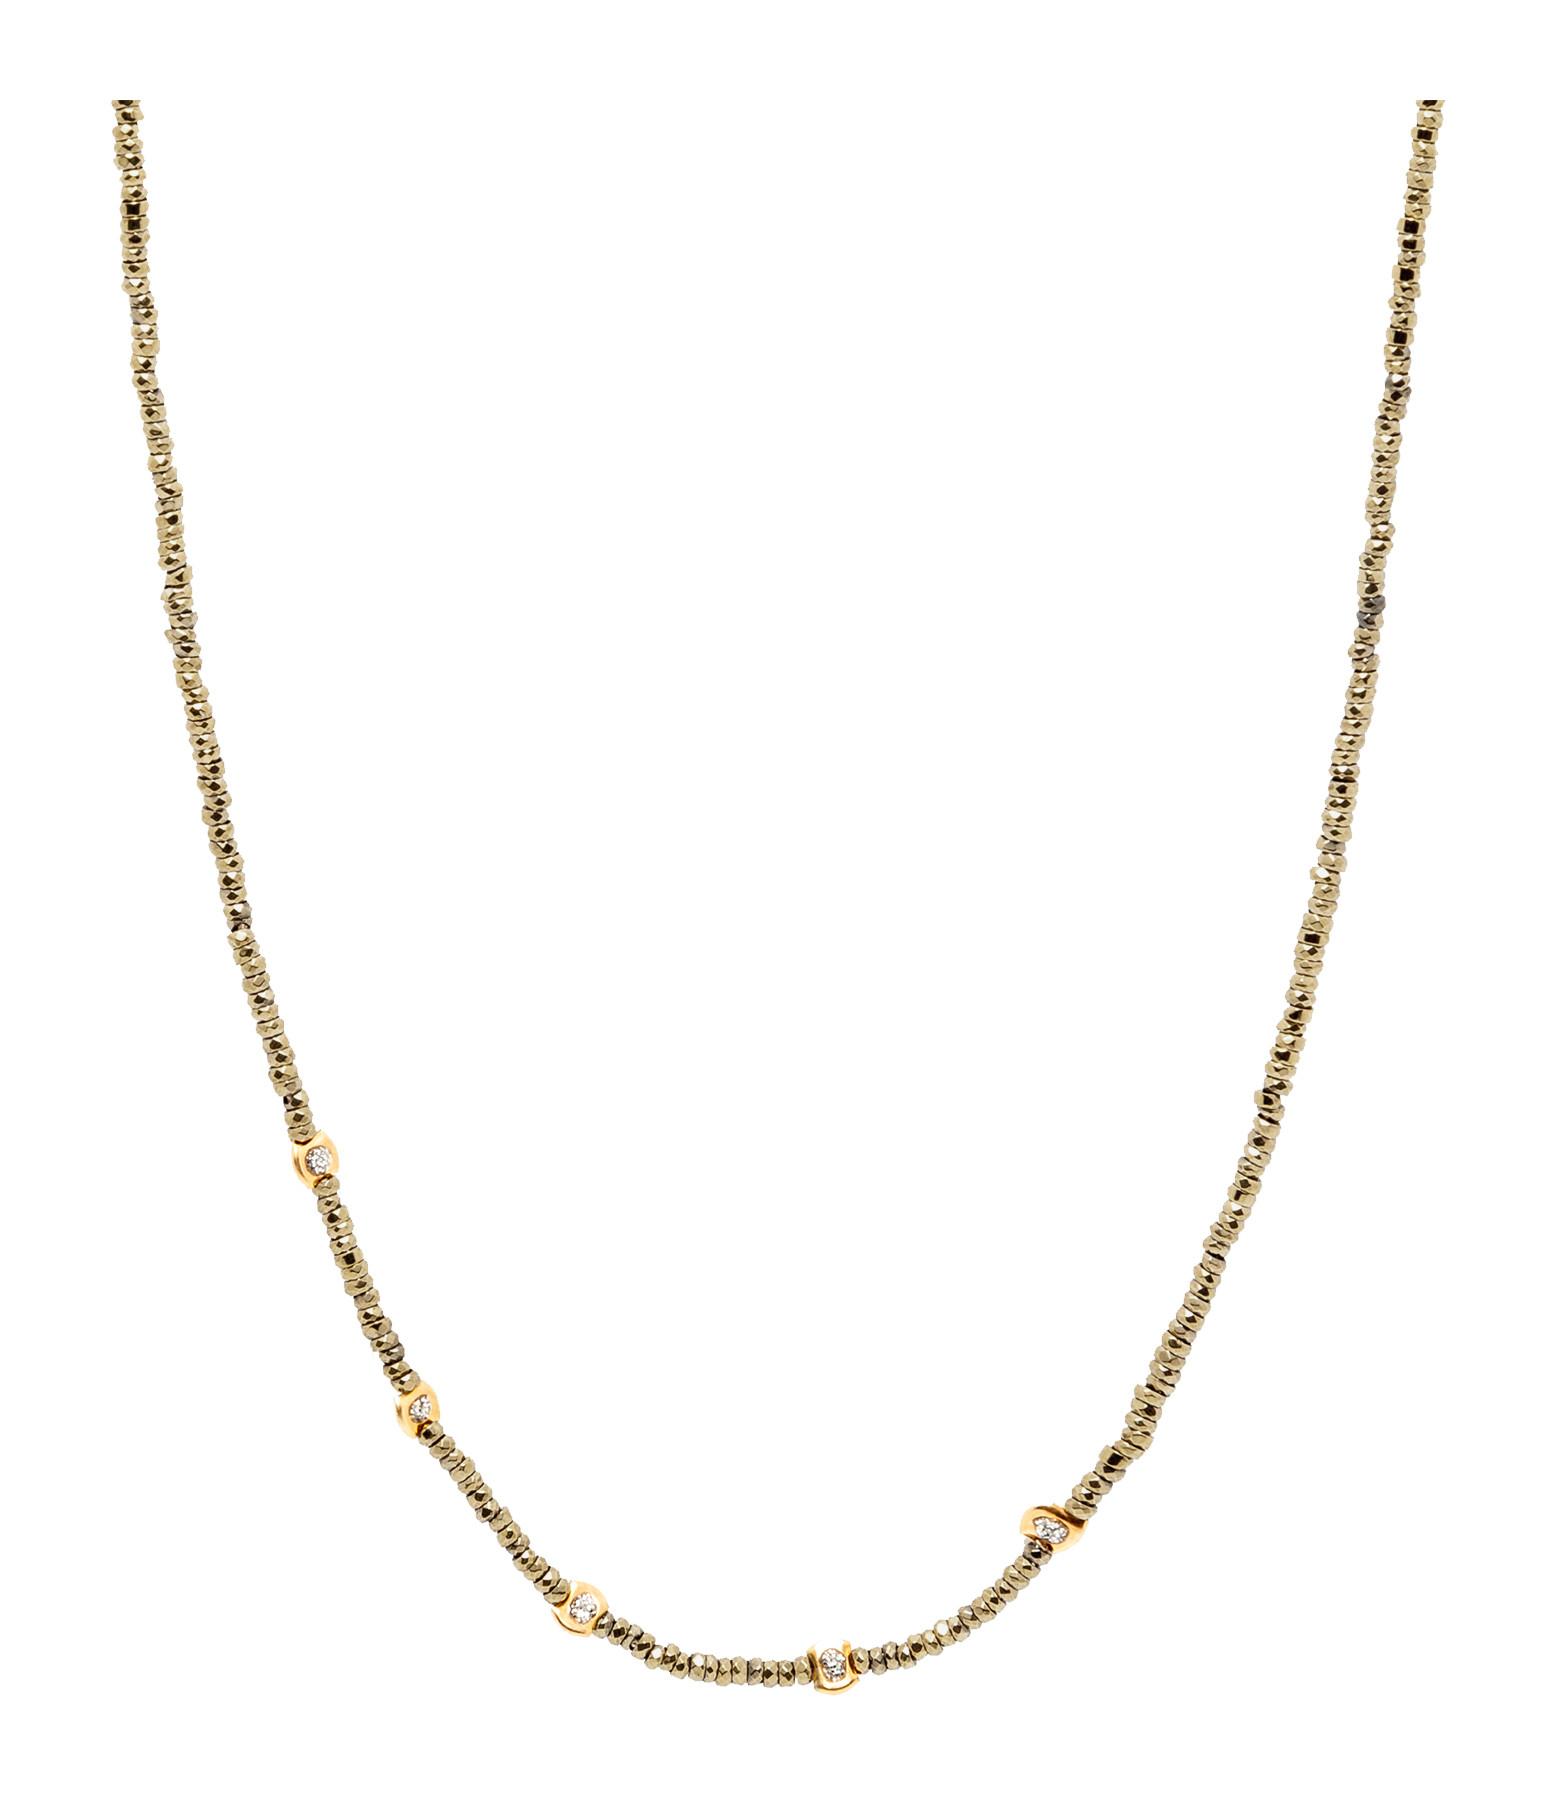 LSONGE - Collier Sublime 5 Perles Or Hématite Kaki